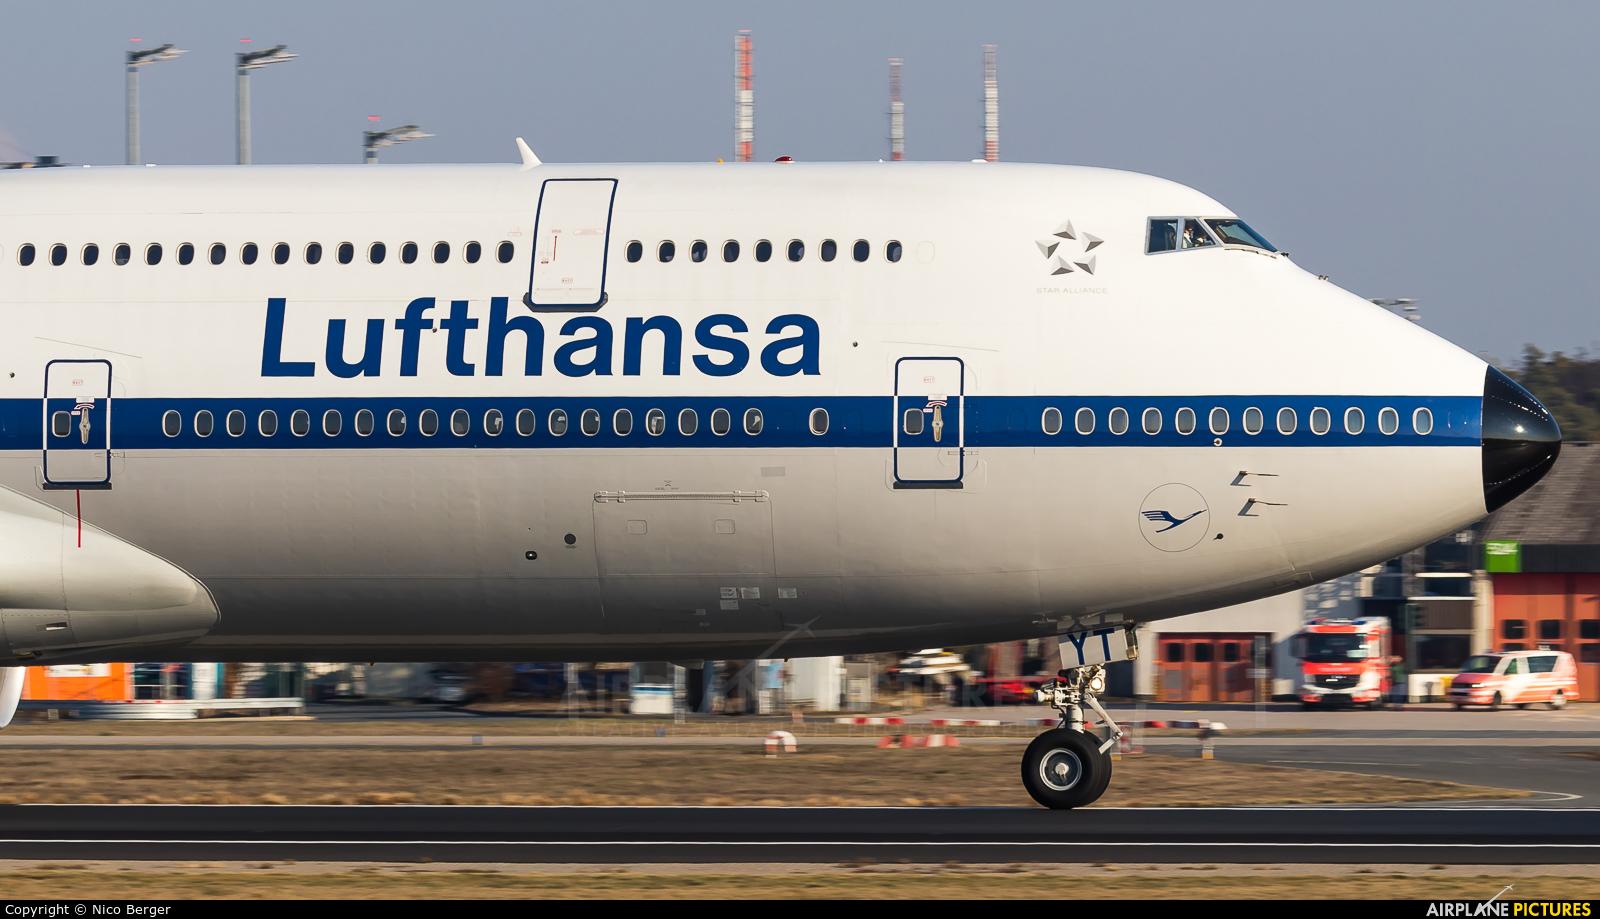 Lufthansa D-ABYT aircraft at Frankfurt